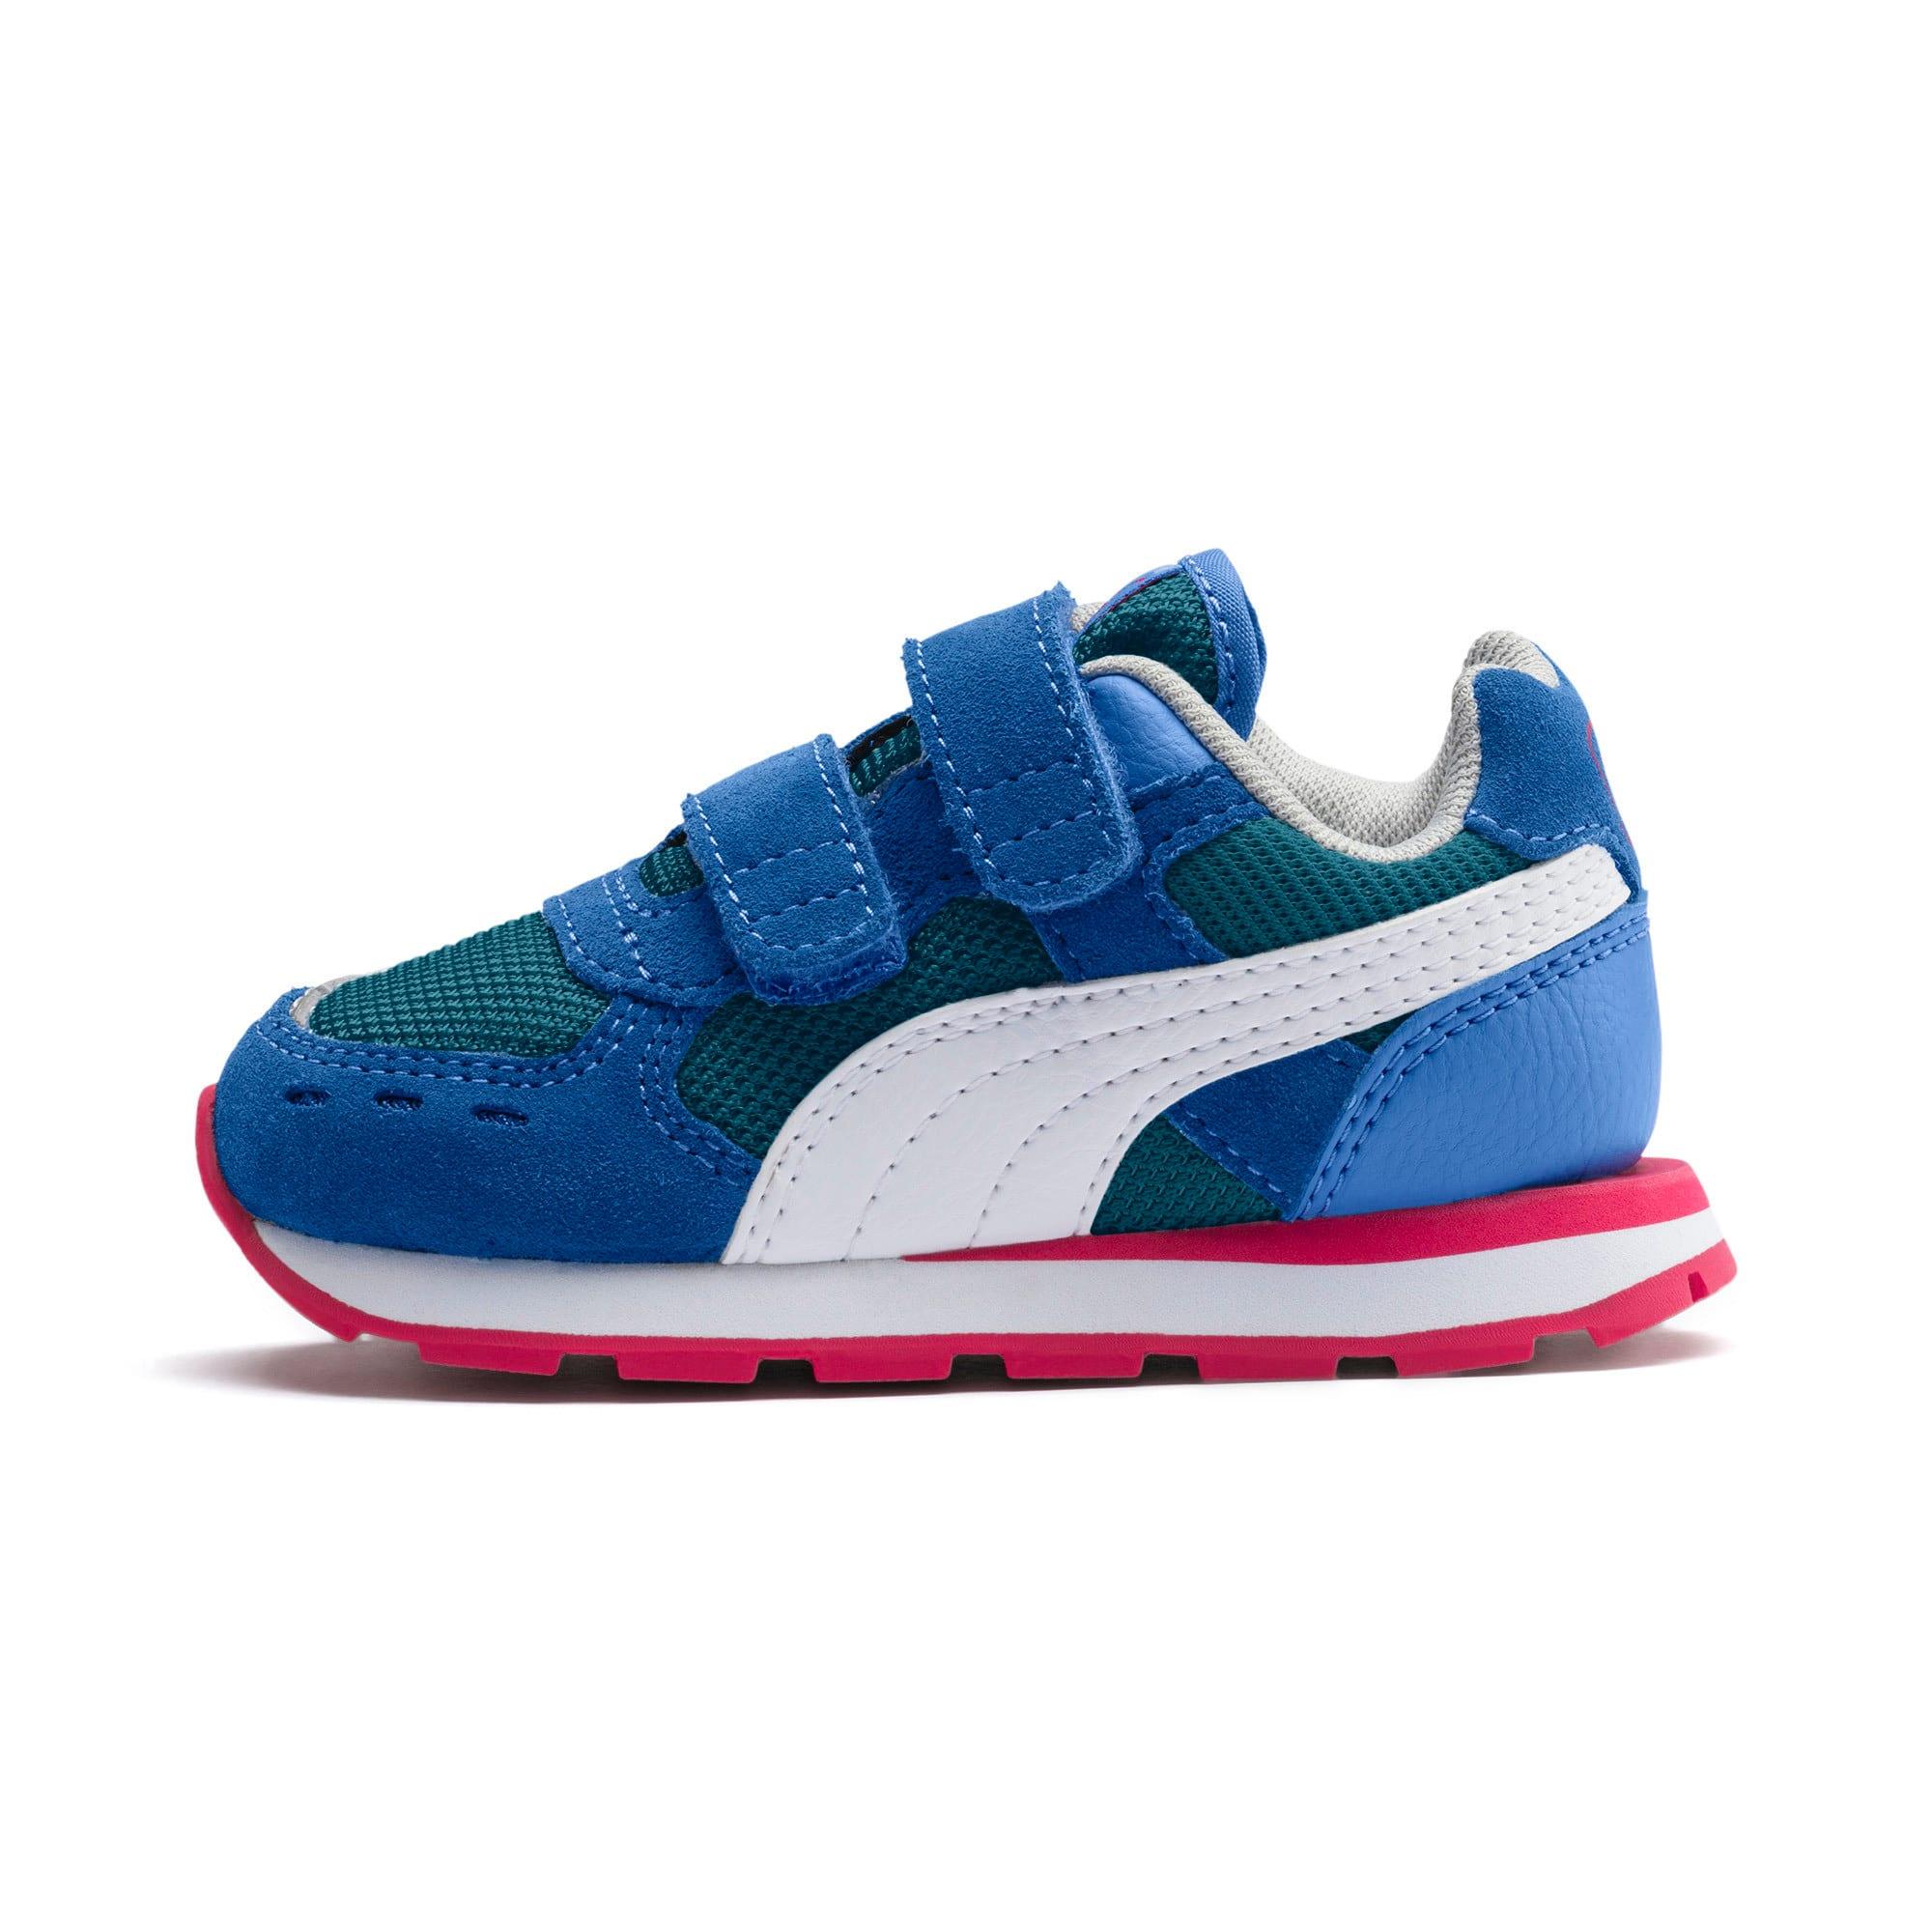 Thumbnail 1 of Vista Toddler Shoes, Ultramarine-Puma White, medium